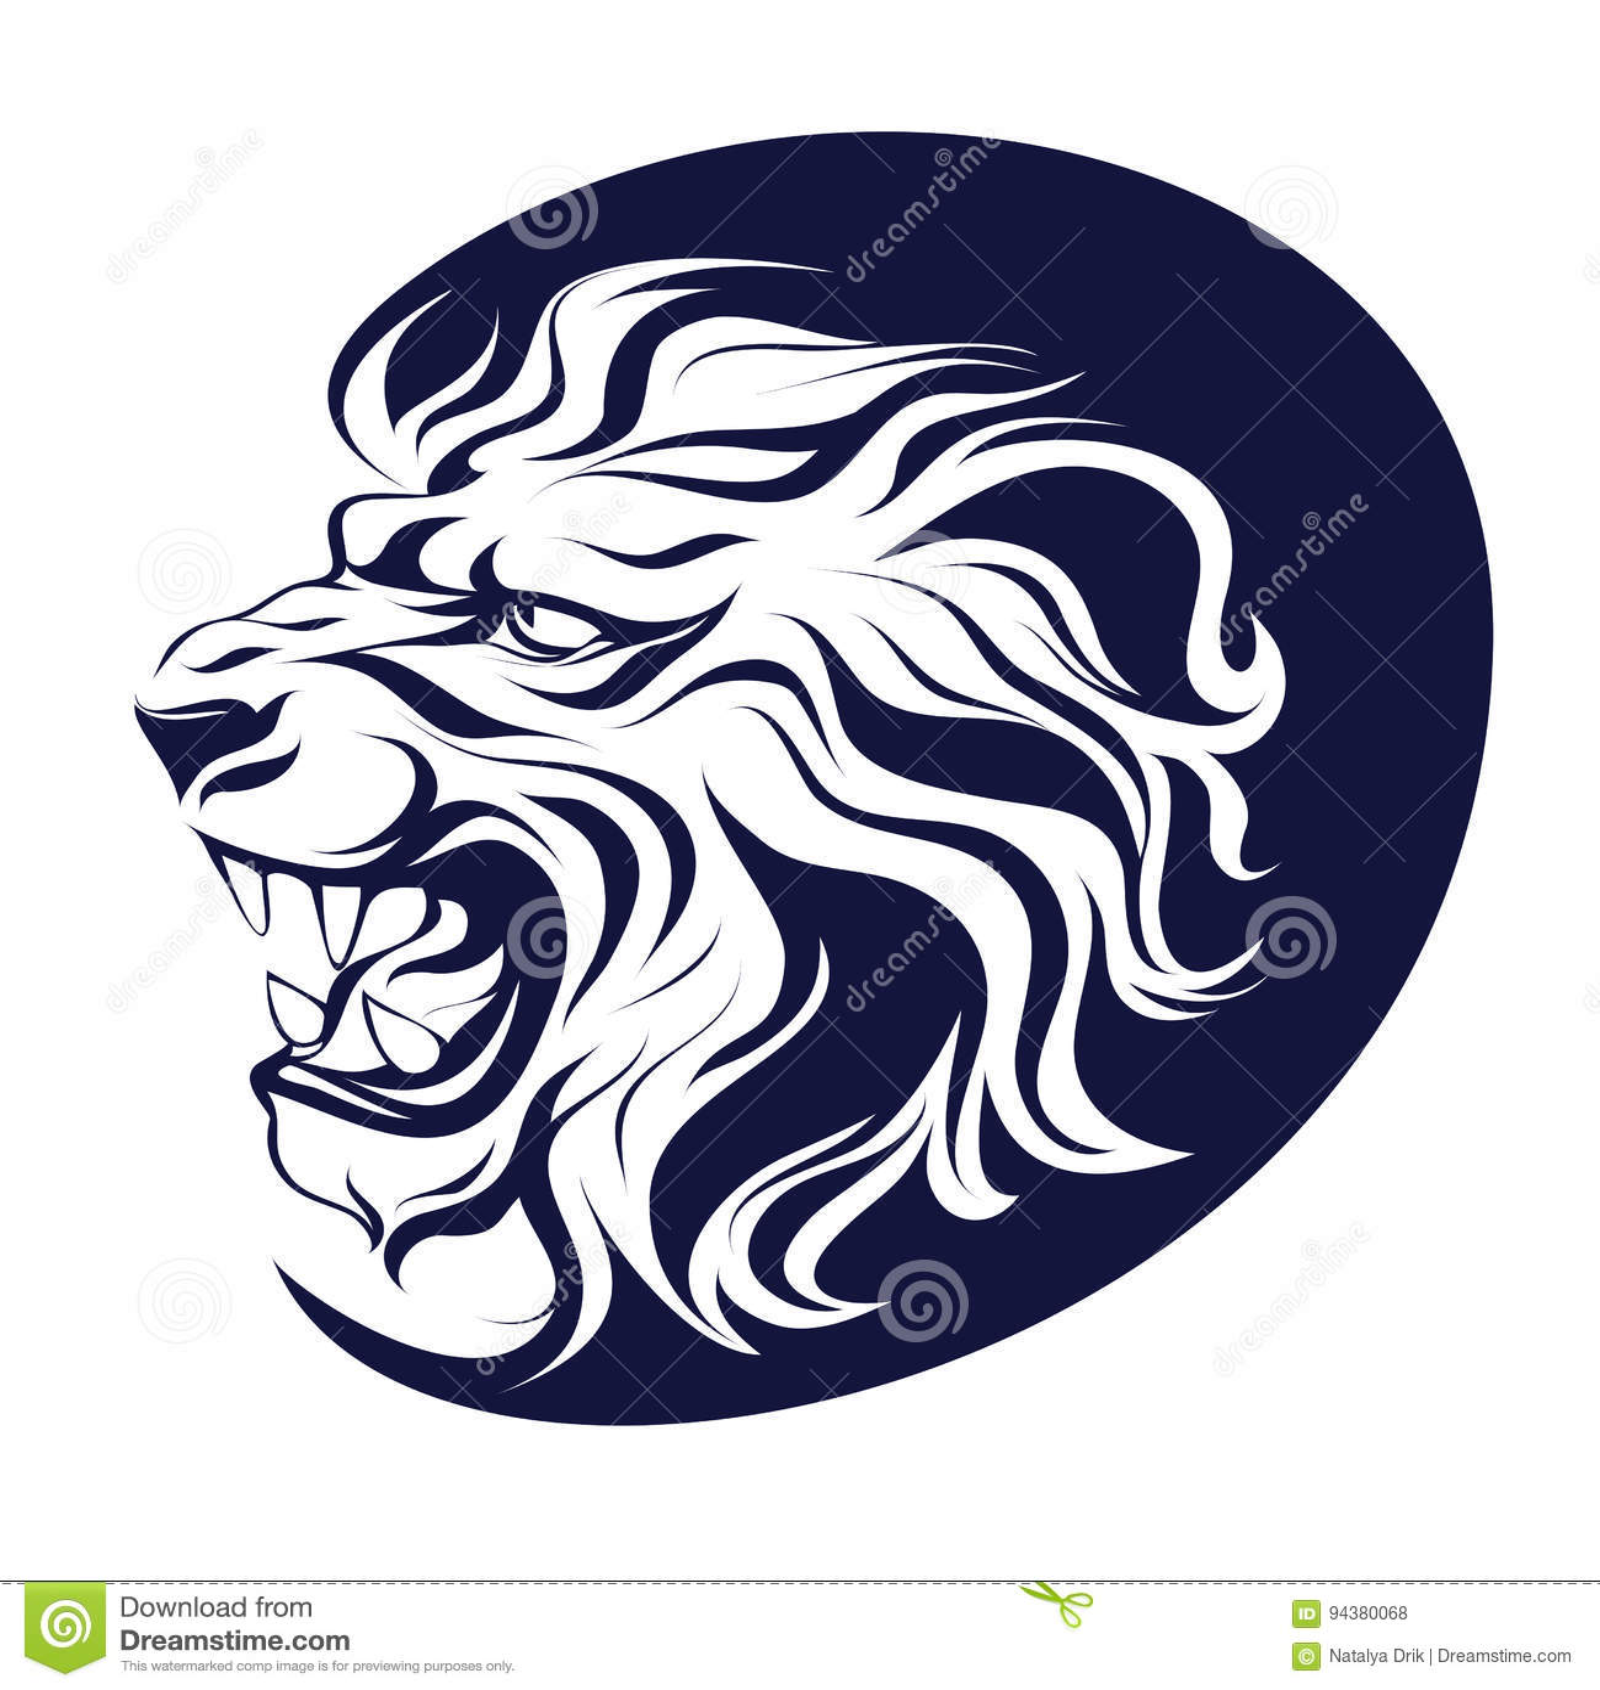 Roaring Lion Profile Tattoo Growling Cartoo...